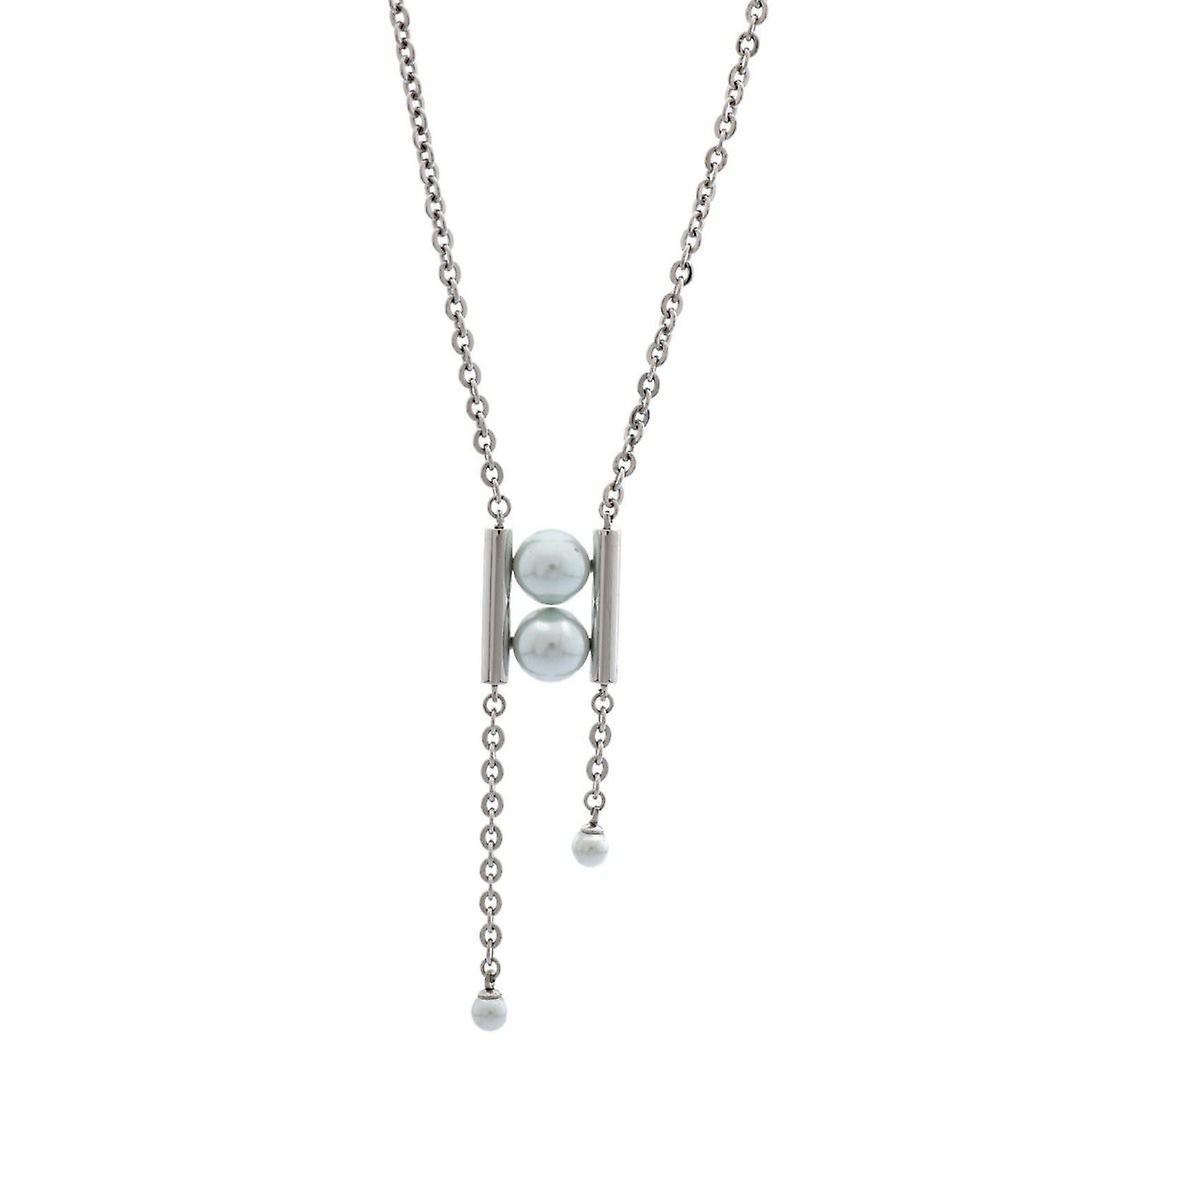 Misaki ladies necklace stainless steel MARINE QCRPMARINE